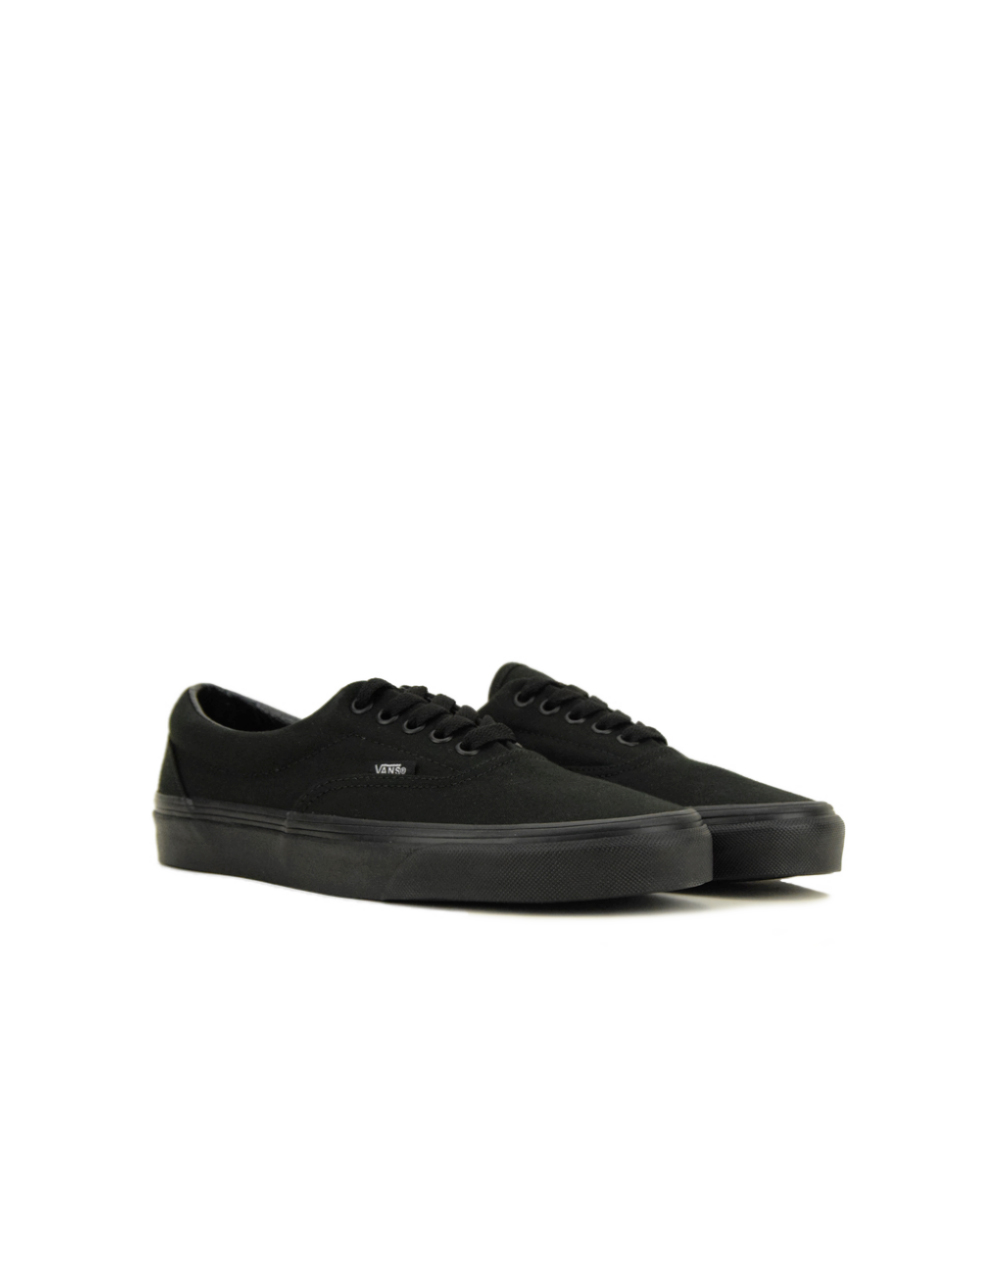 Vans Era (VN000QFKBKA1) Black/Black